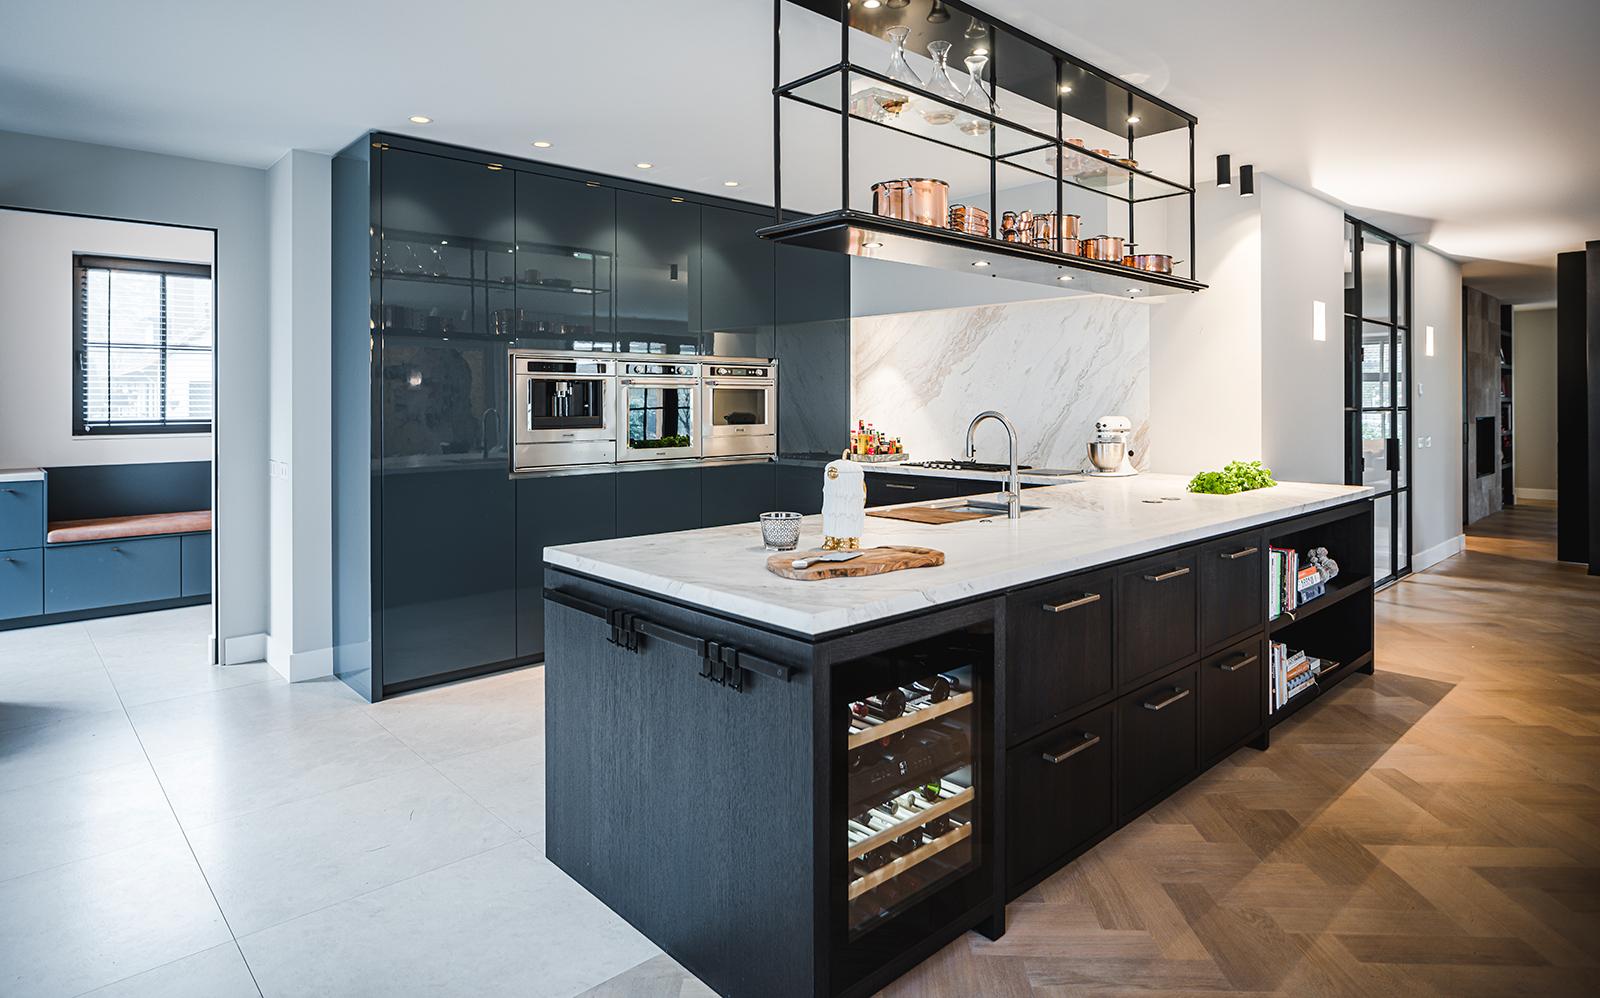 Designkeuken. marmer keukenblad, Astrid jeulink, Culimaat, zwart